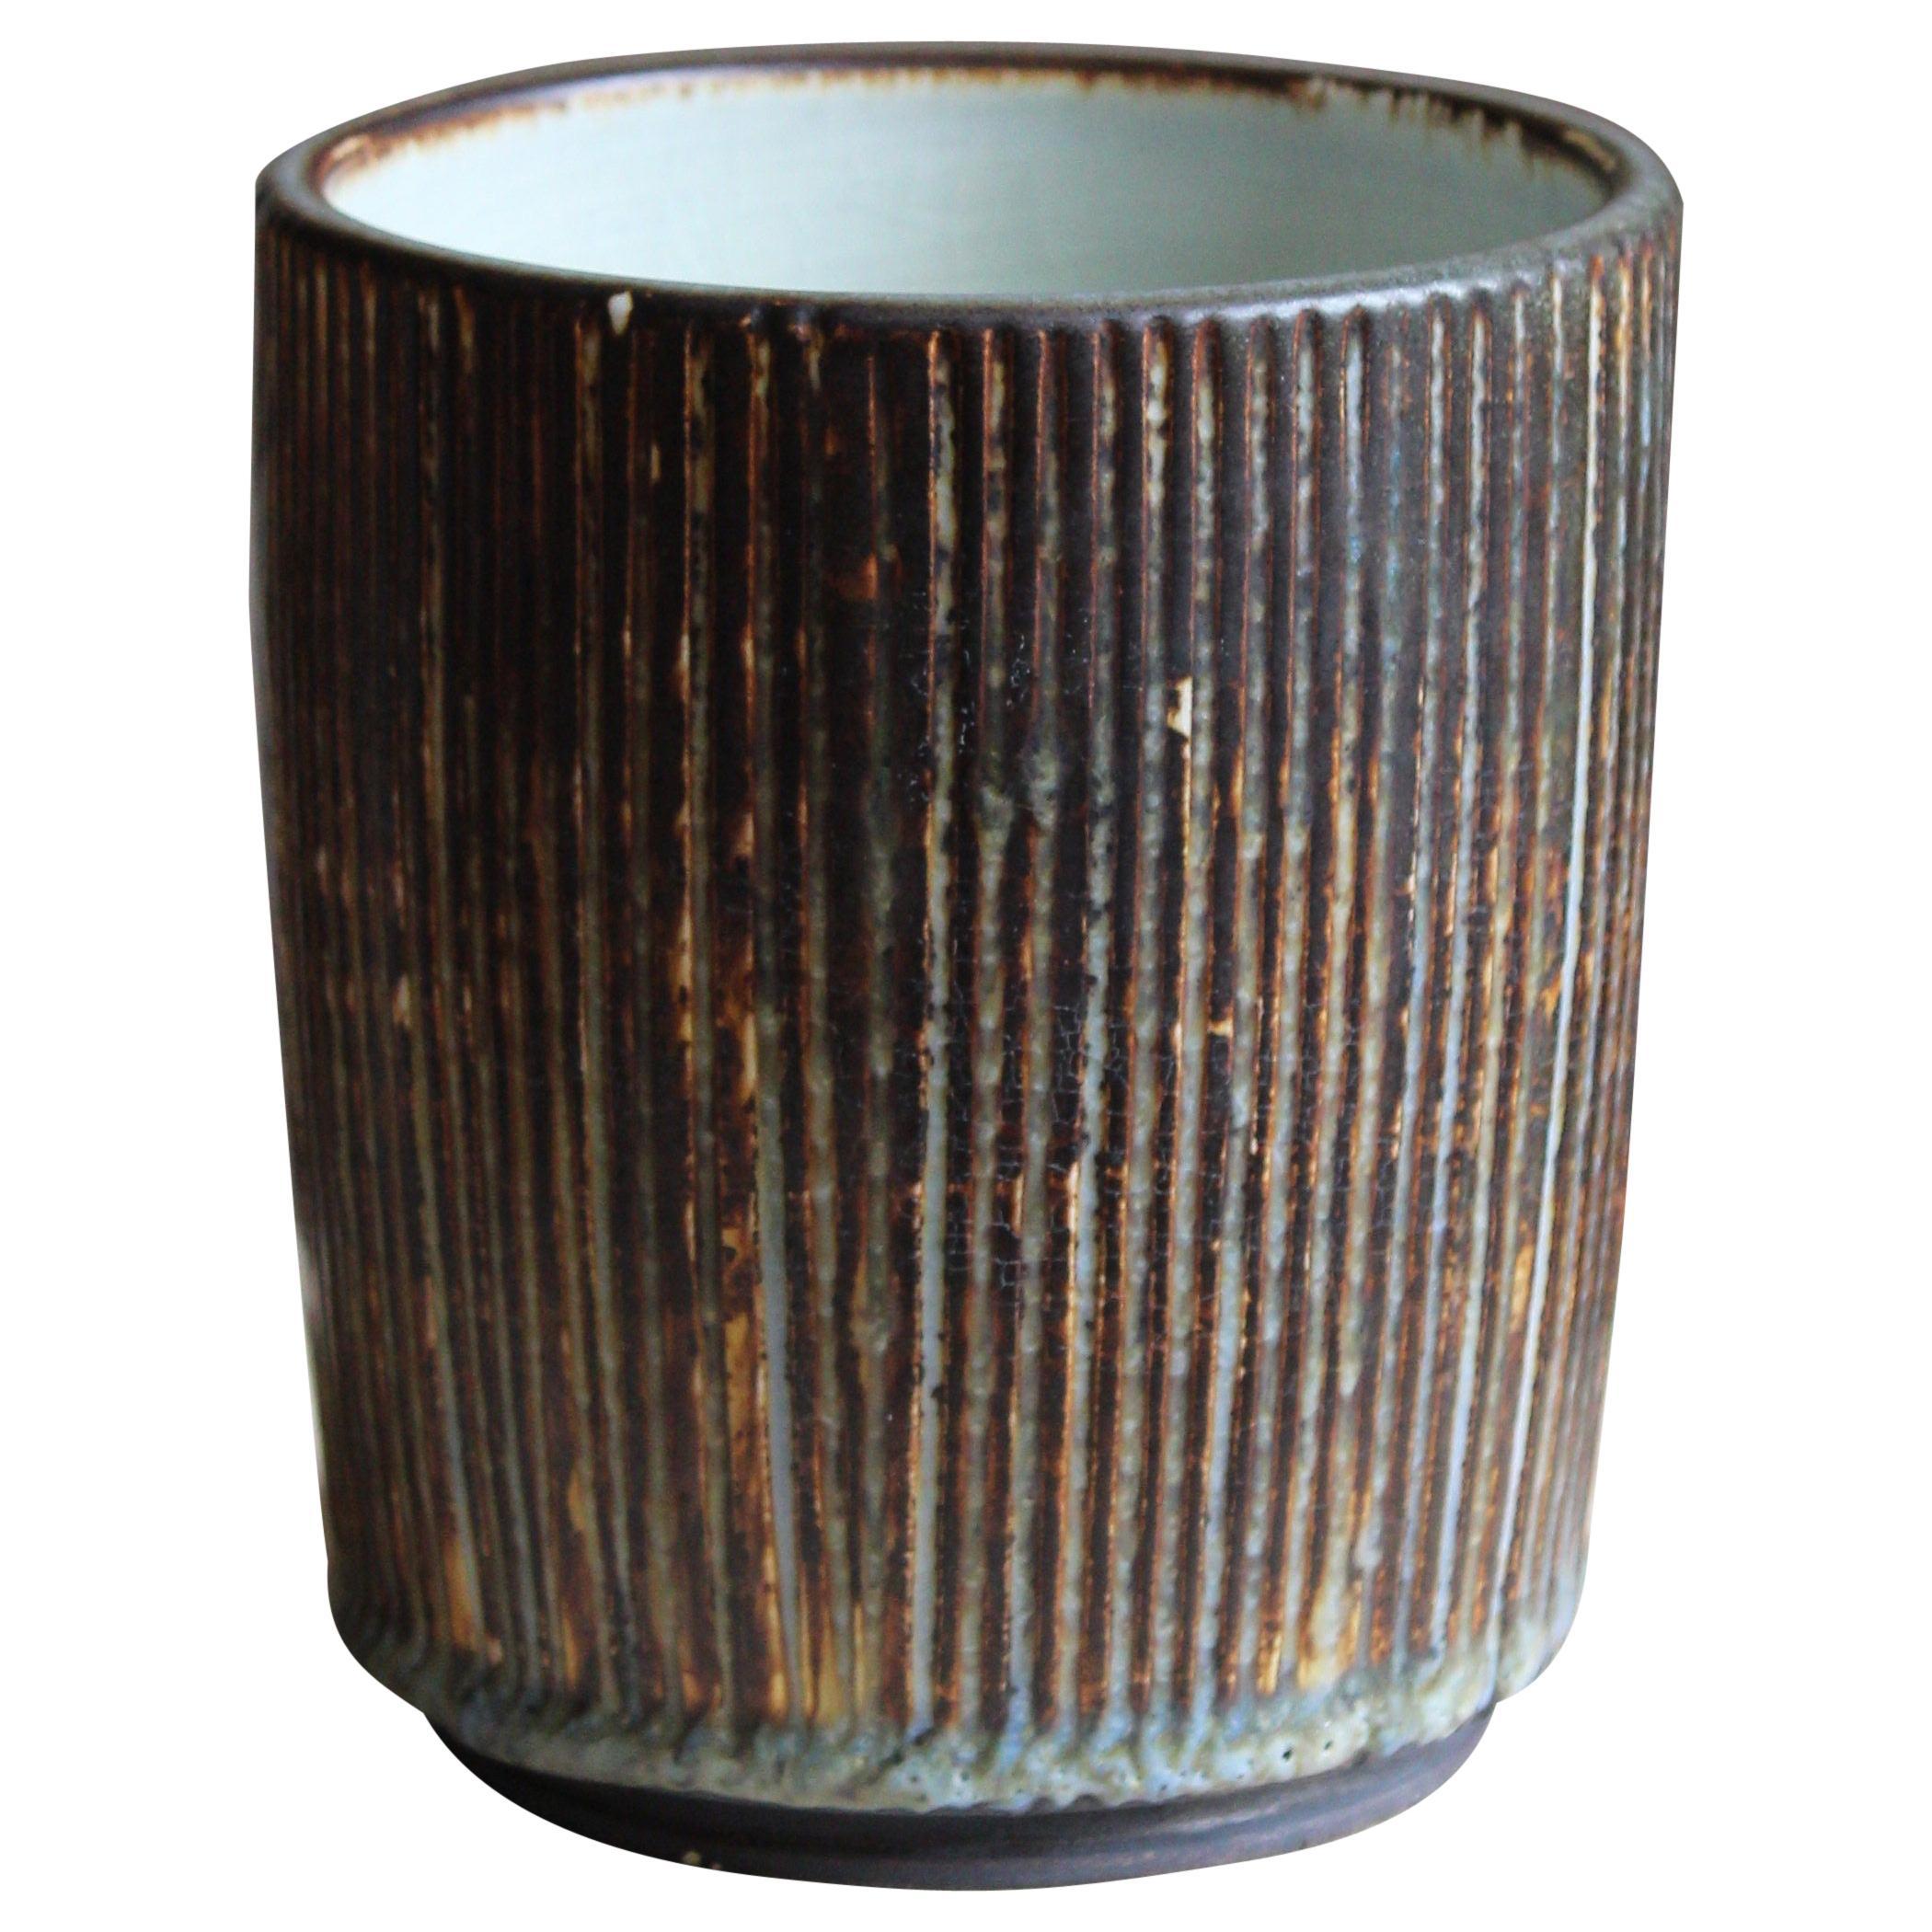 Gertrud Lönegren, Small Modernist Vase, Glazed Stoneware, Rörstrand, 1950s